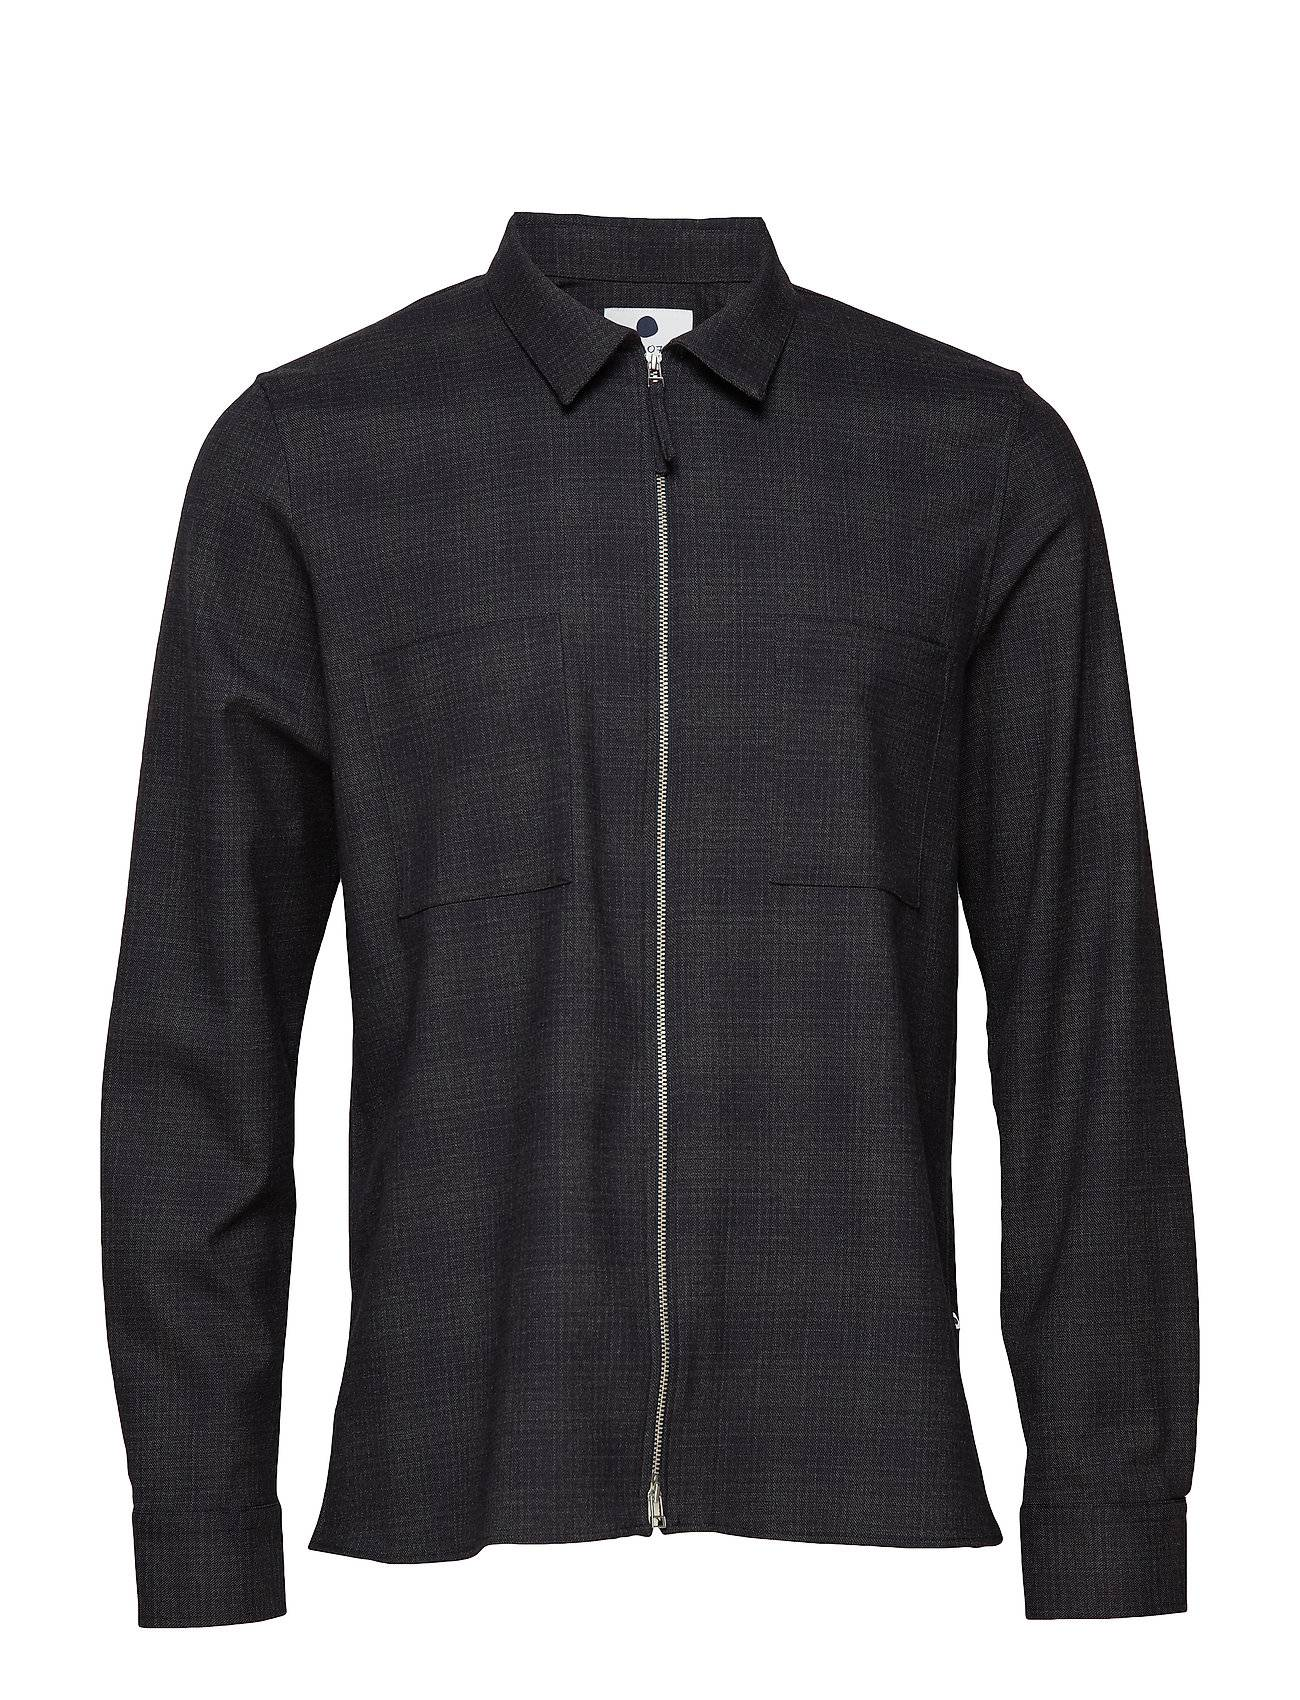 NN07 Angus Zip Shirt 1317